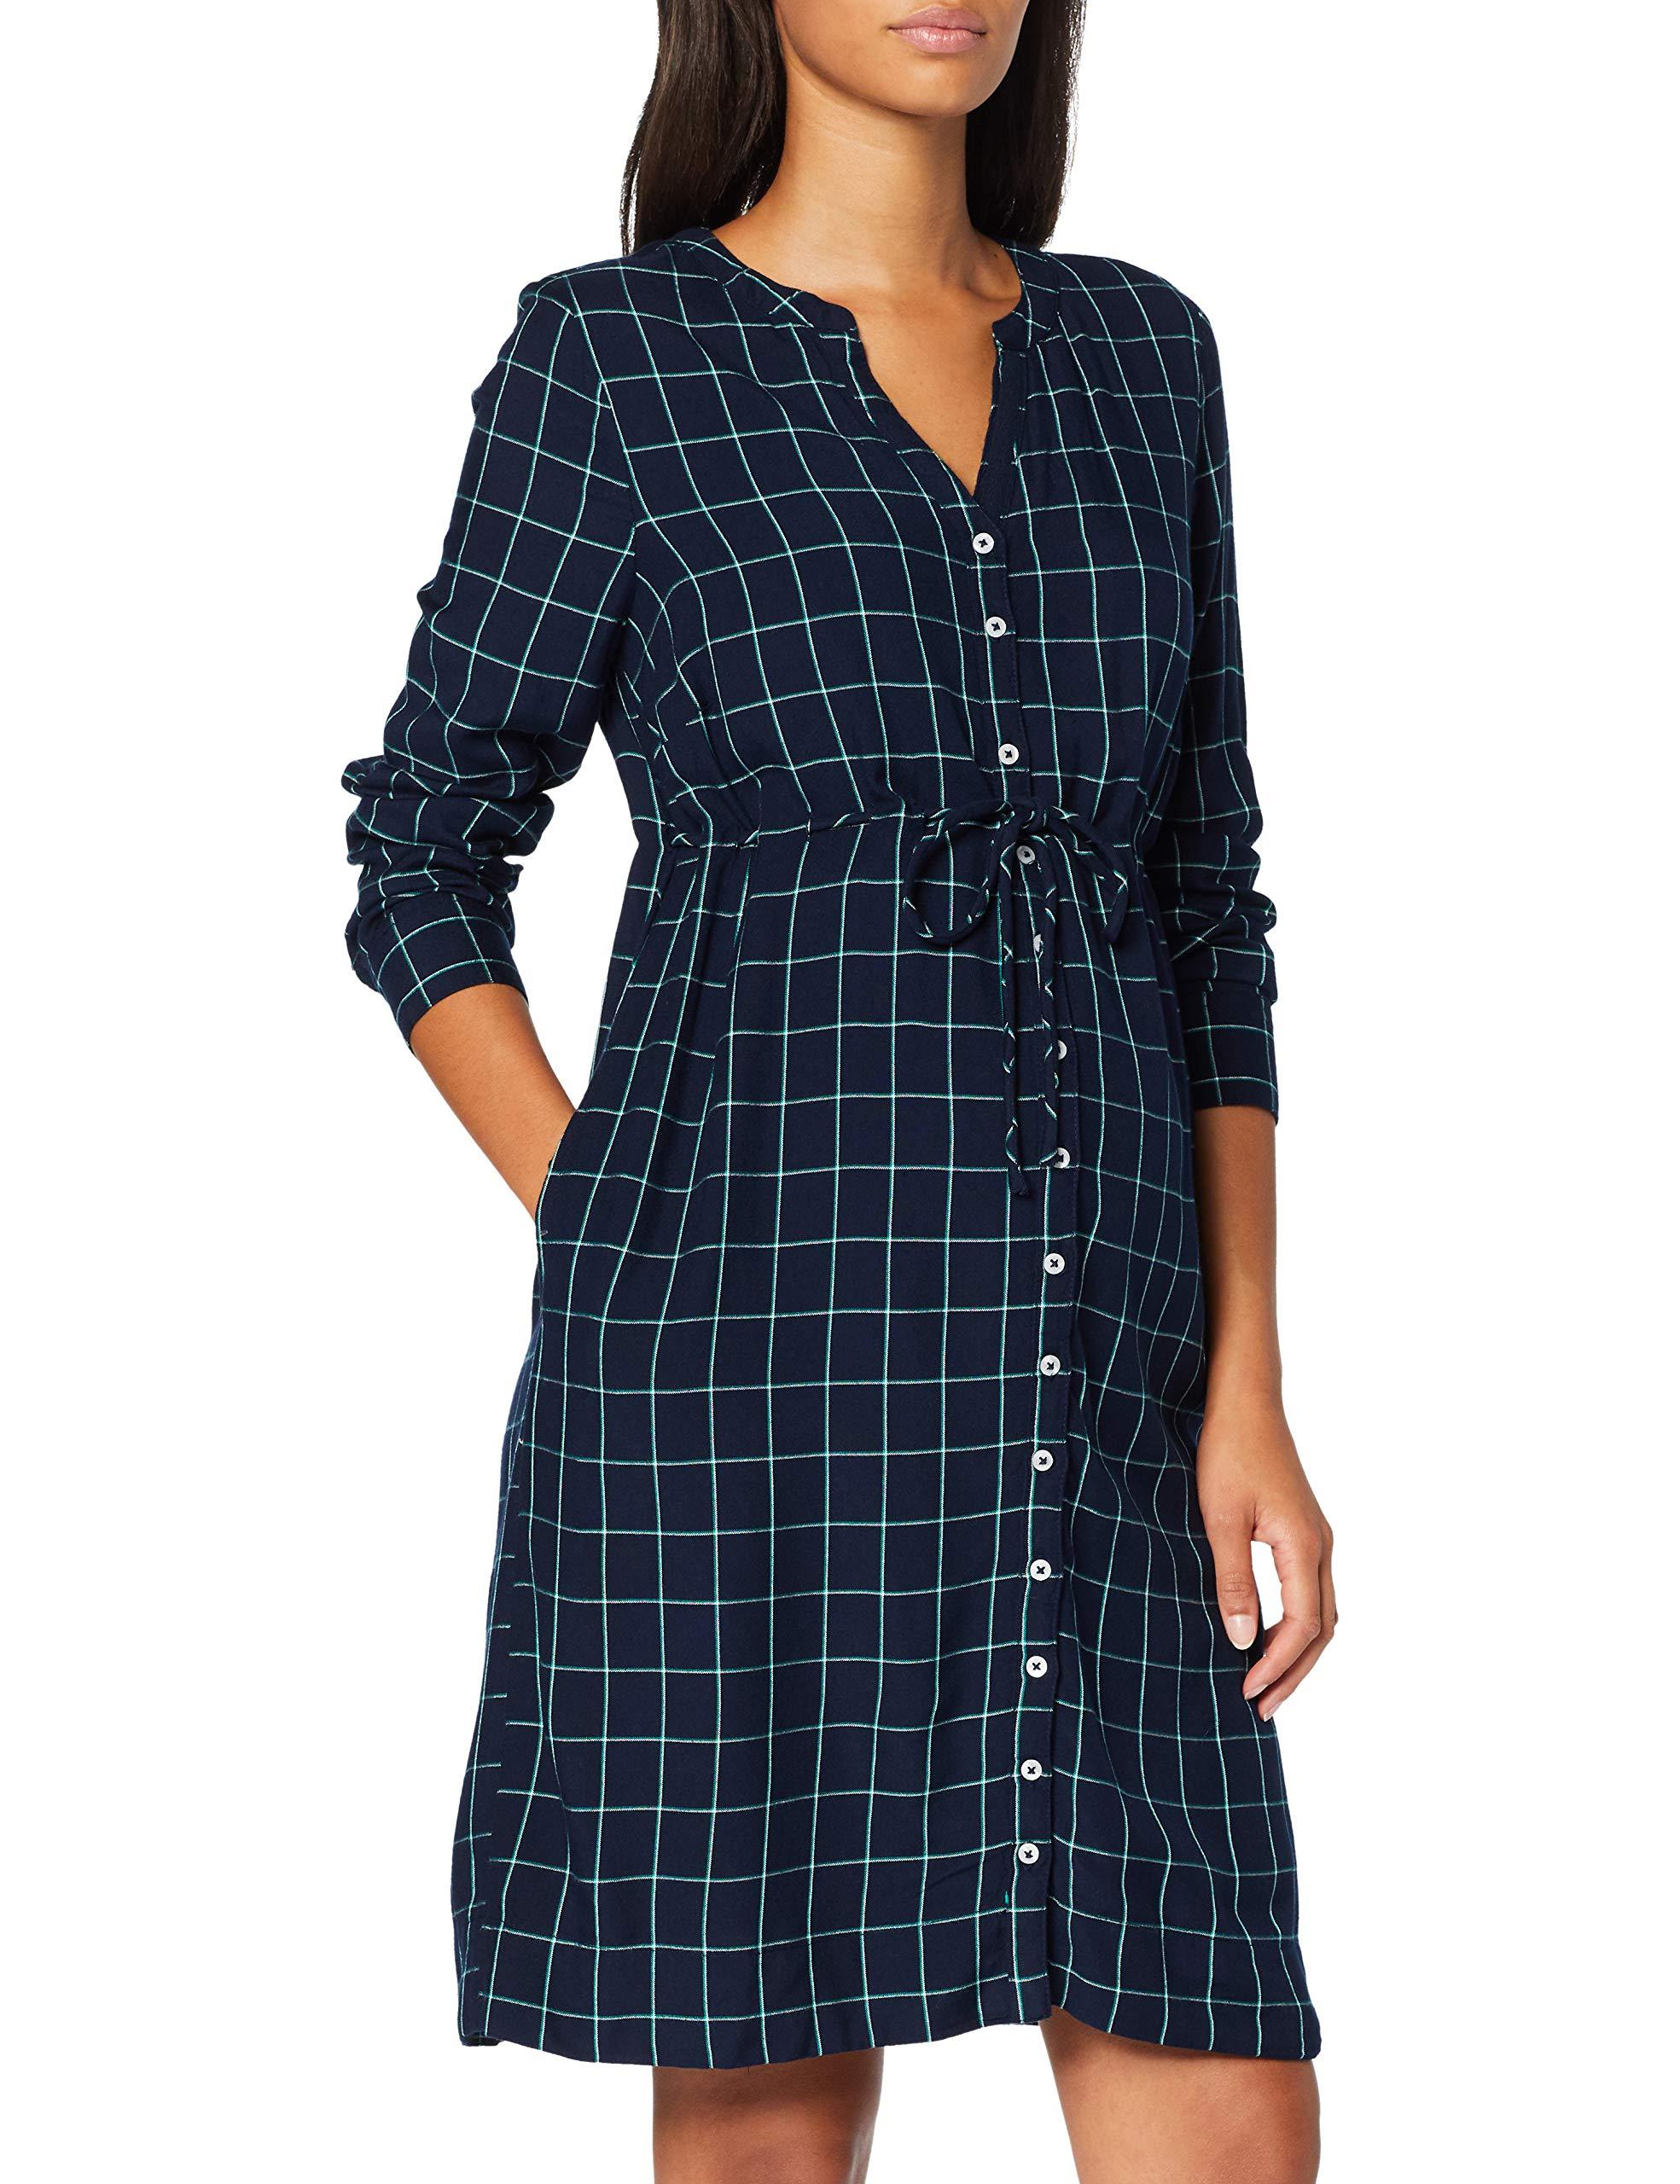 Esprit Maternity Dress Fabricant38 Ls Yd CheckRobe FemmeBleunight Blue 48640taille Wvn gbf7yYIvm6